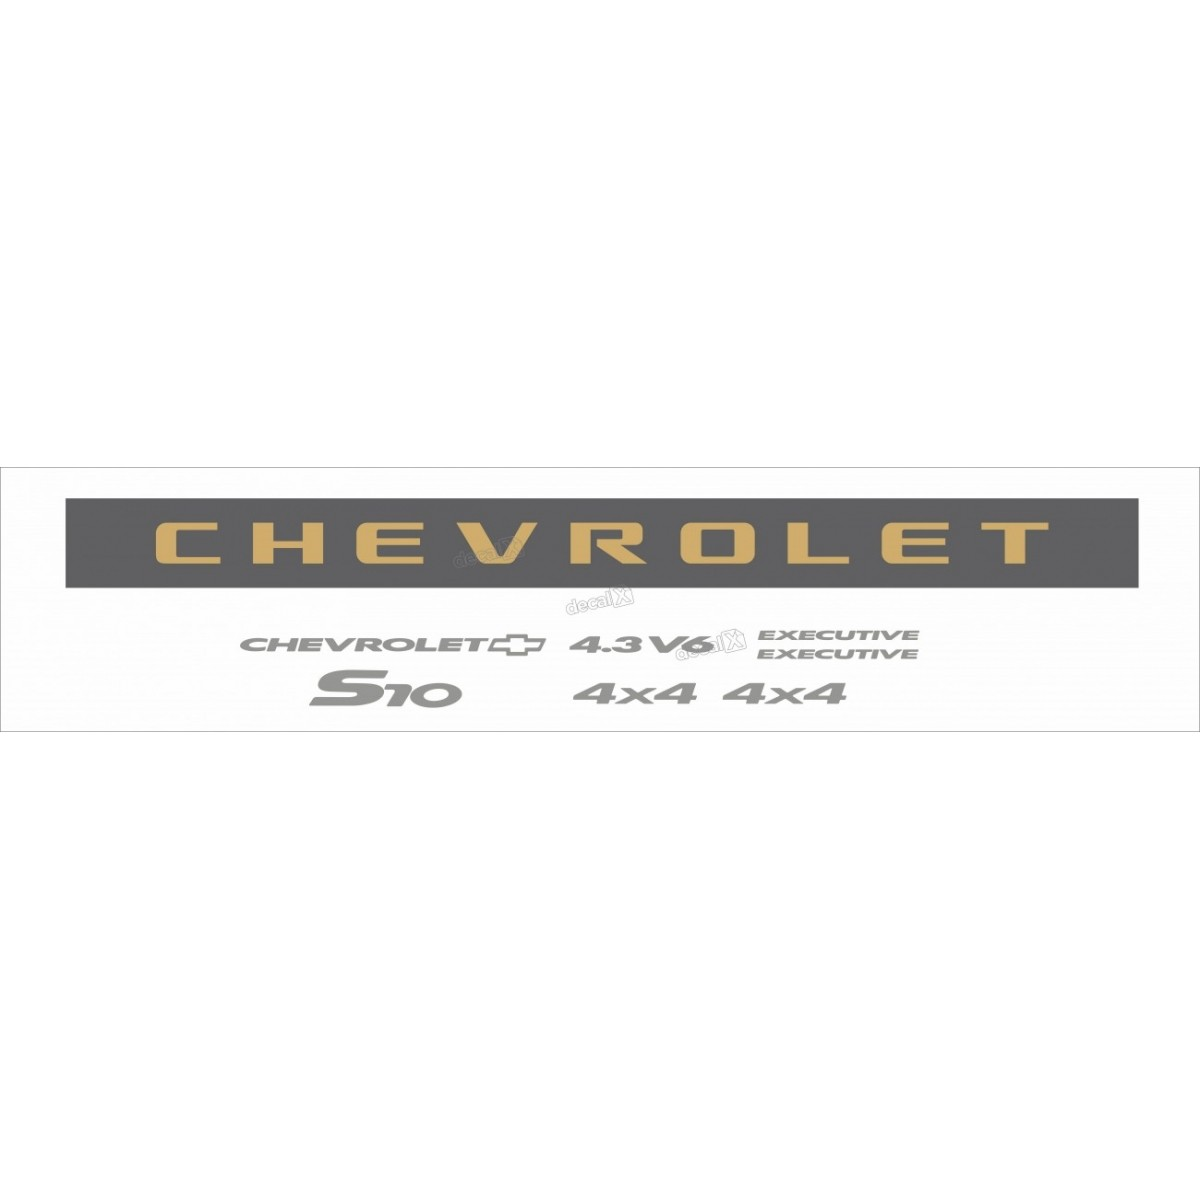 Kit Adesivo Chevrolet S10 Exec. 4.3v6 2006 A 2008 S10kit73